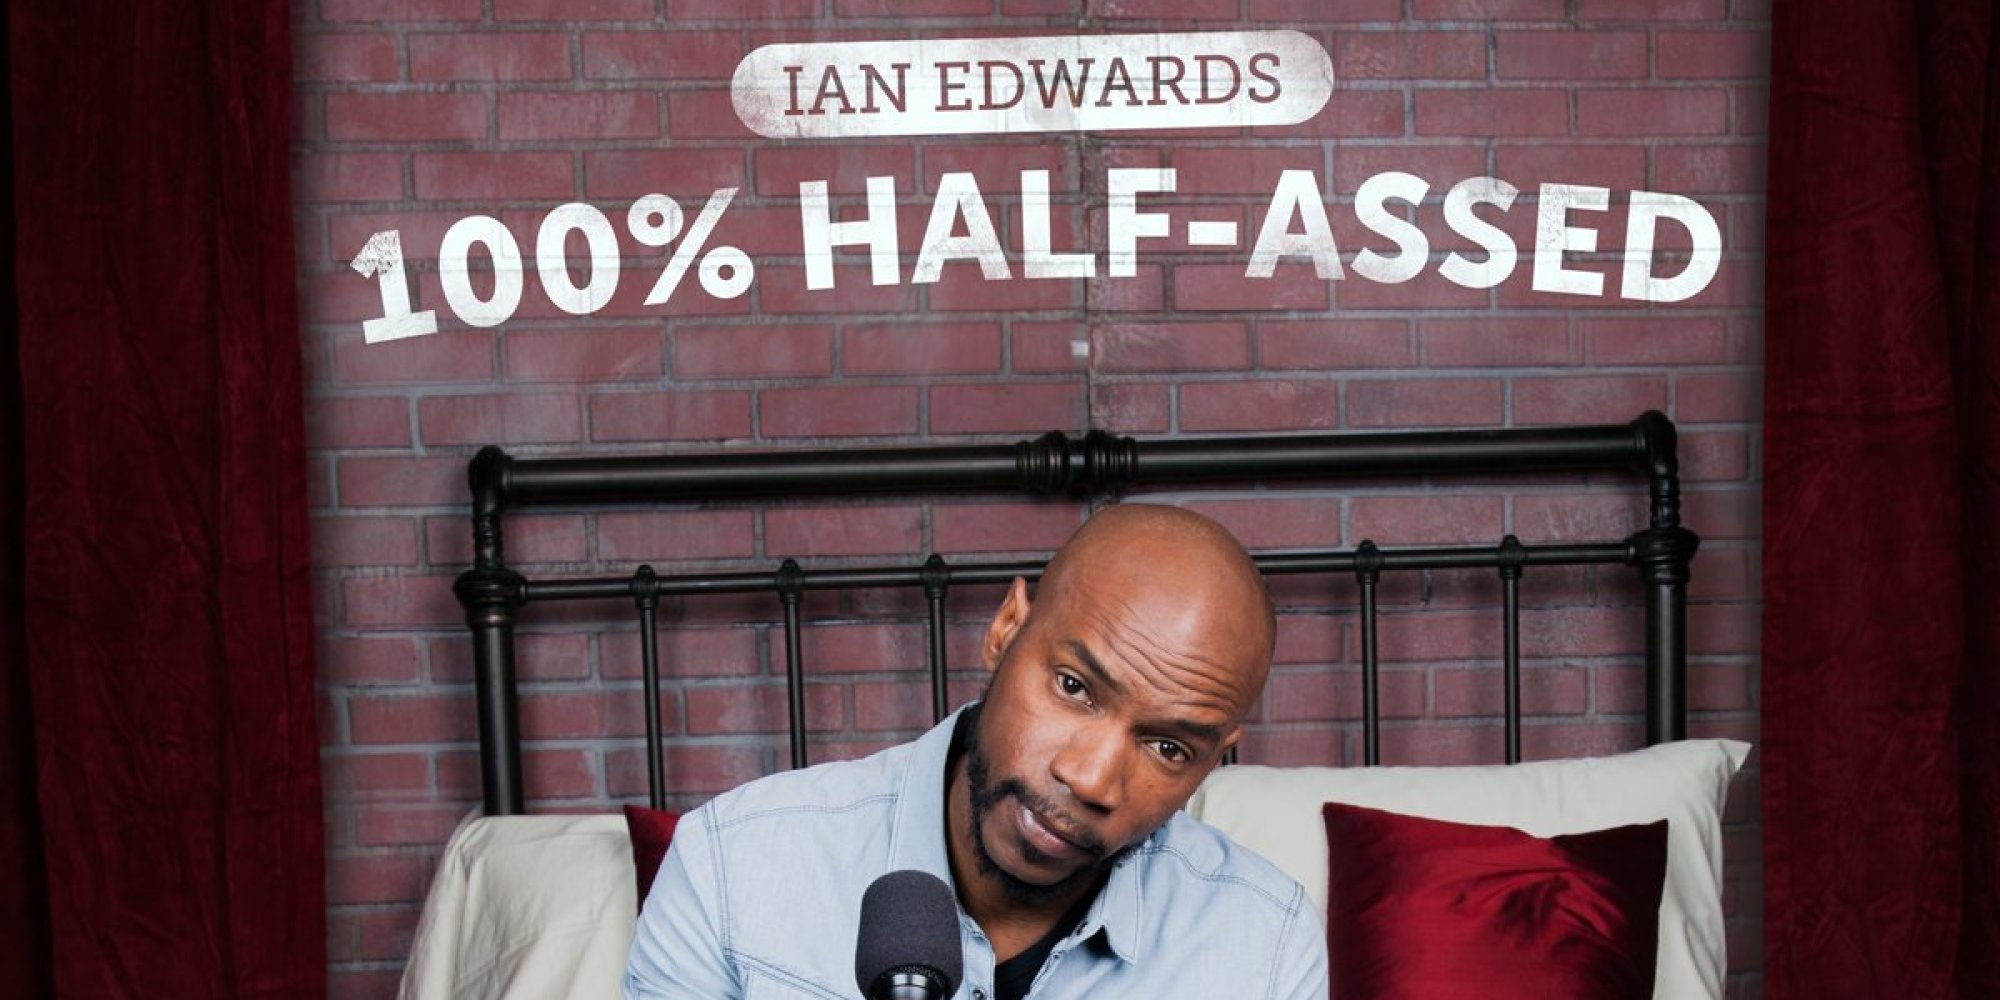 ian edwards imdb